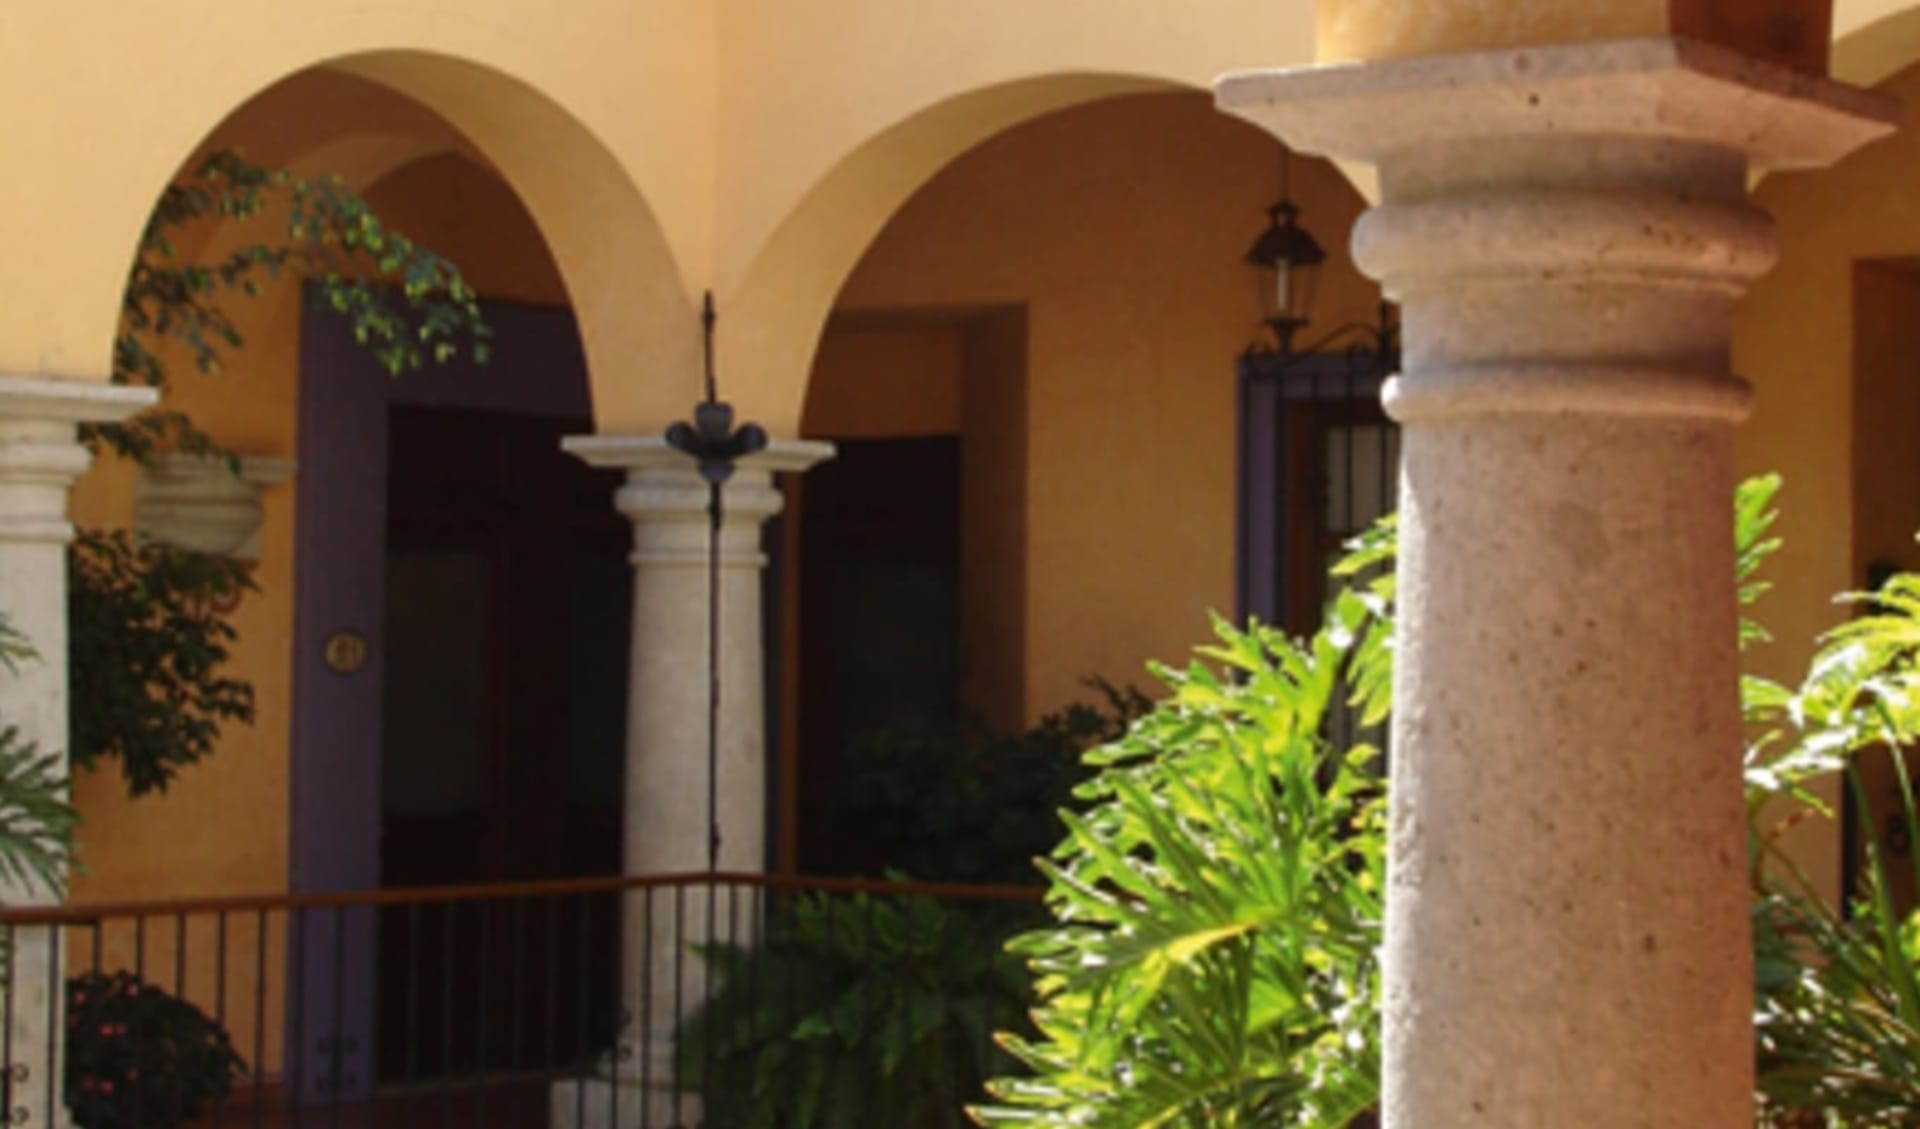 Hostal de La Noria in Oaxaca: Oaxaca_Hostal de la Noria